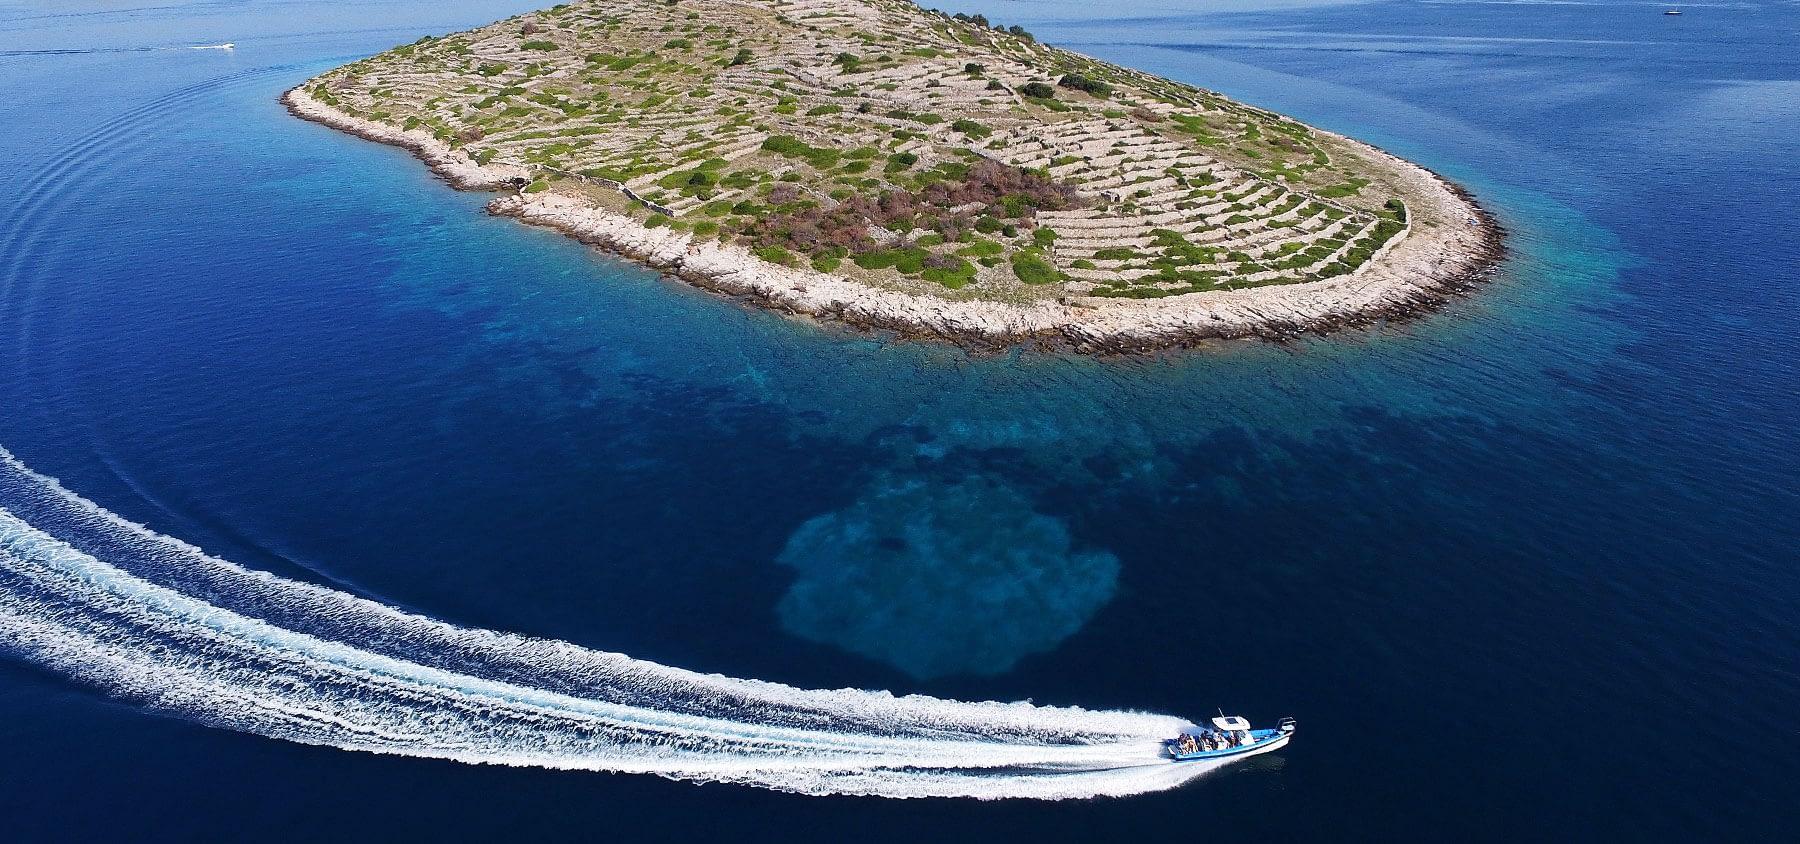 Archipelago Tours Croatia Sibenik boat tour - boat photo passing Bavljenac island from the air